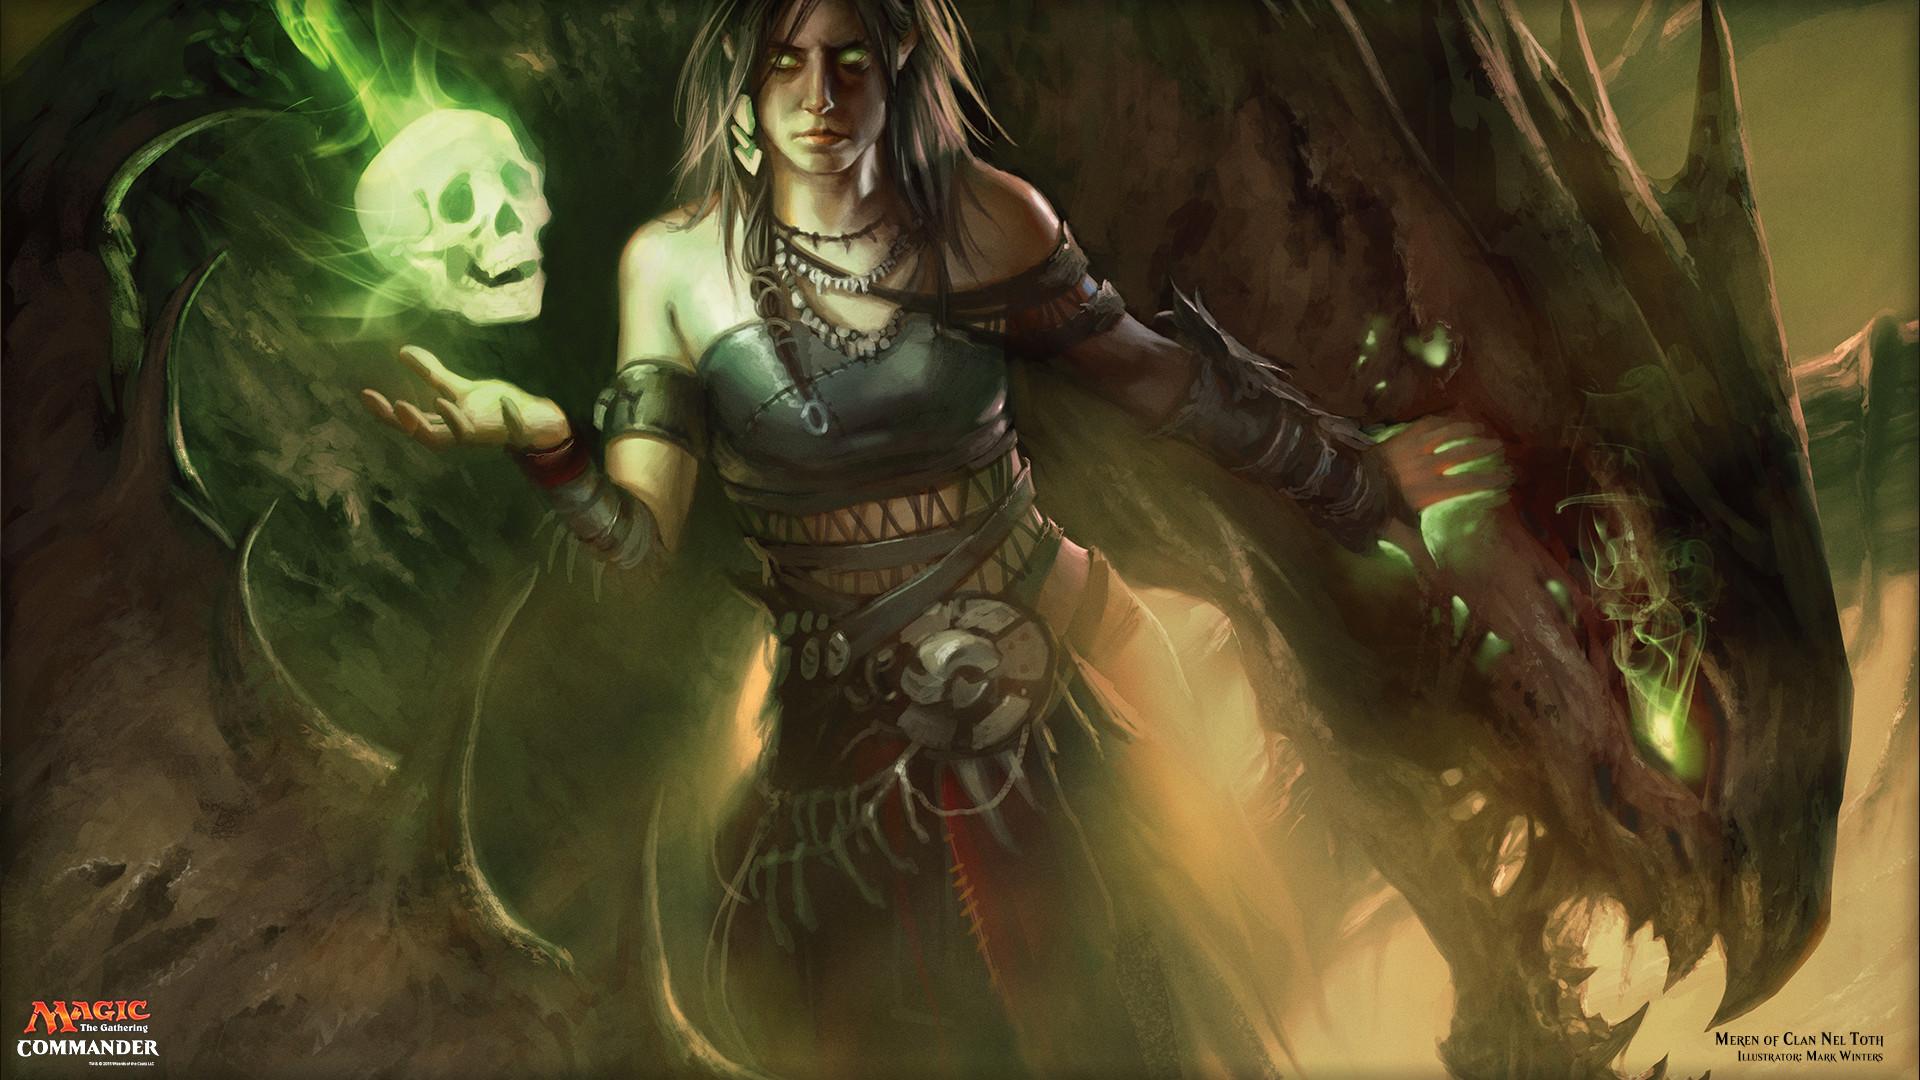 magic.wizards.com sites mtg files images wallpaper Meren-of-Clan-